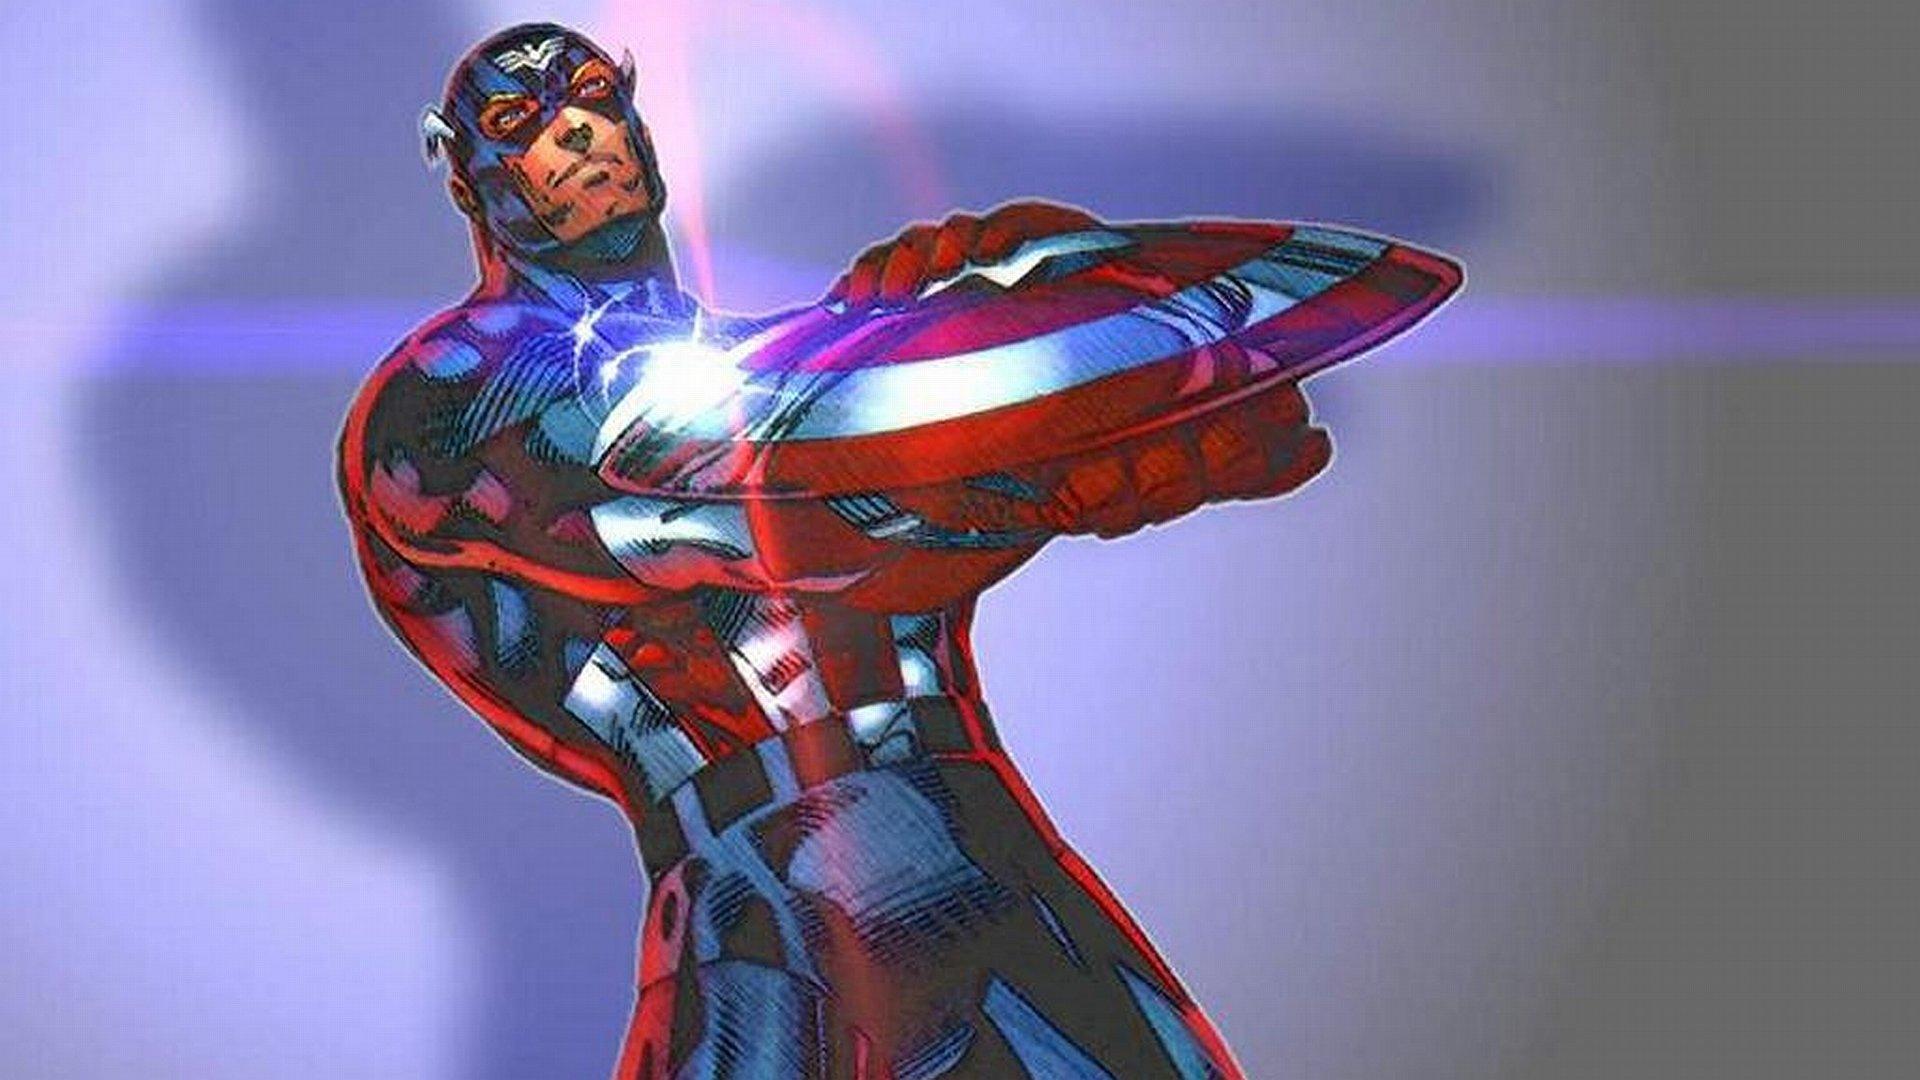 Captain America Marvel Comics Wallpapers 1920x1080 Full Hd 1080p Desktop Backgrounds